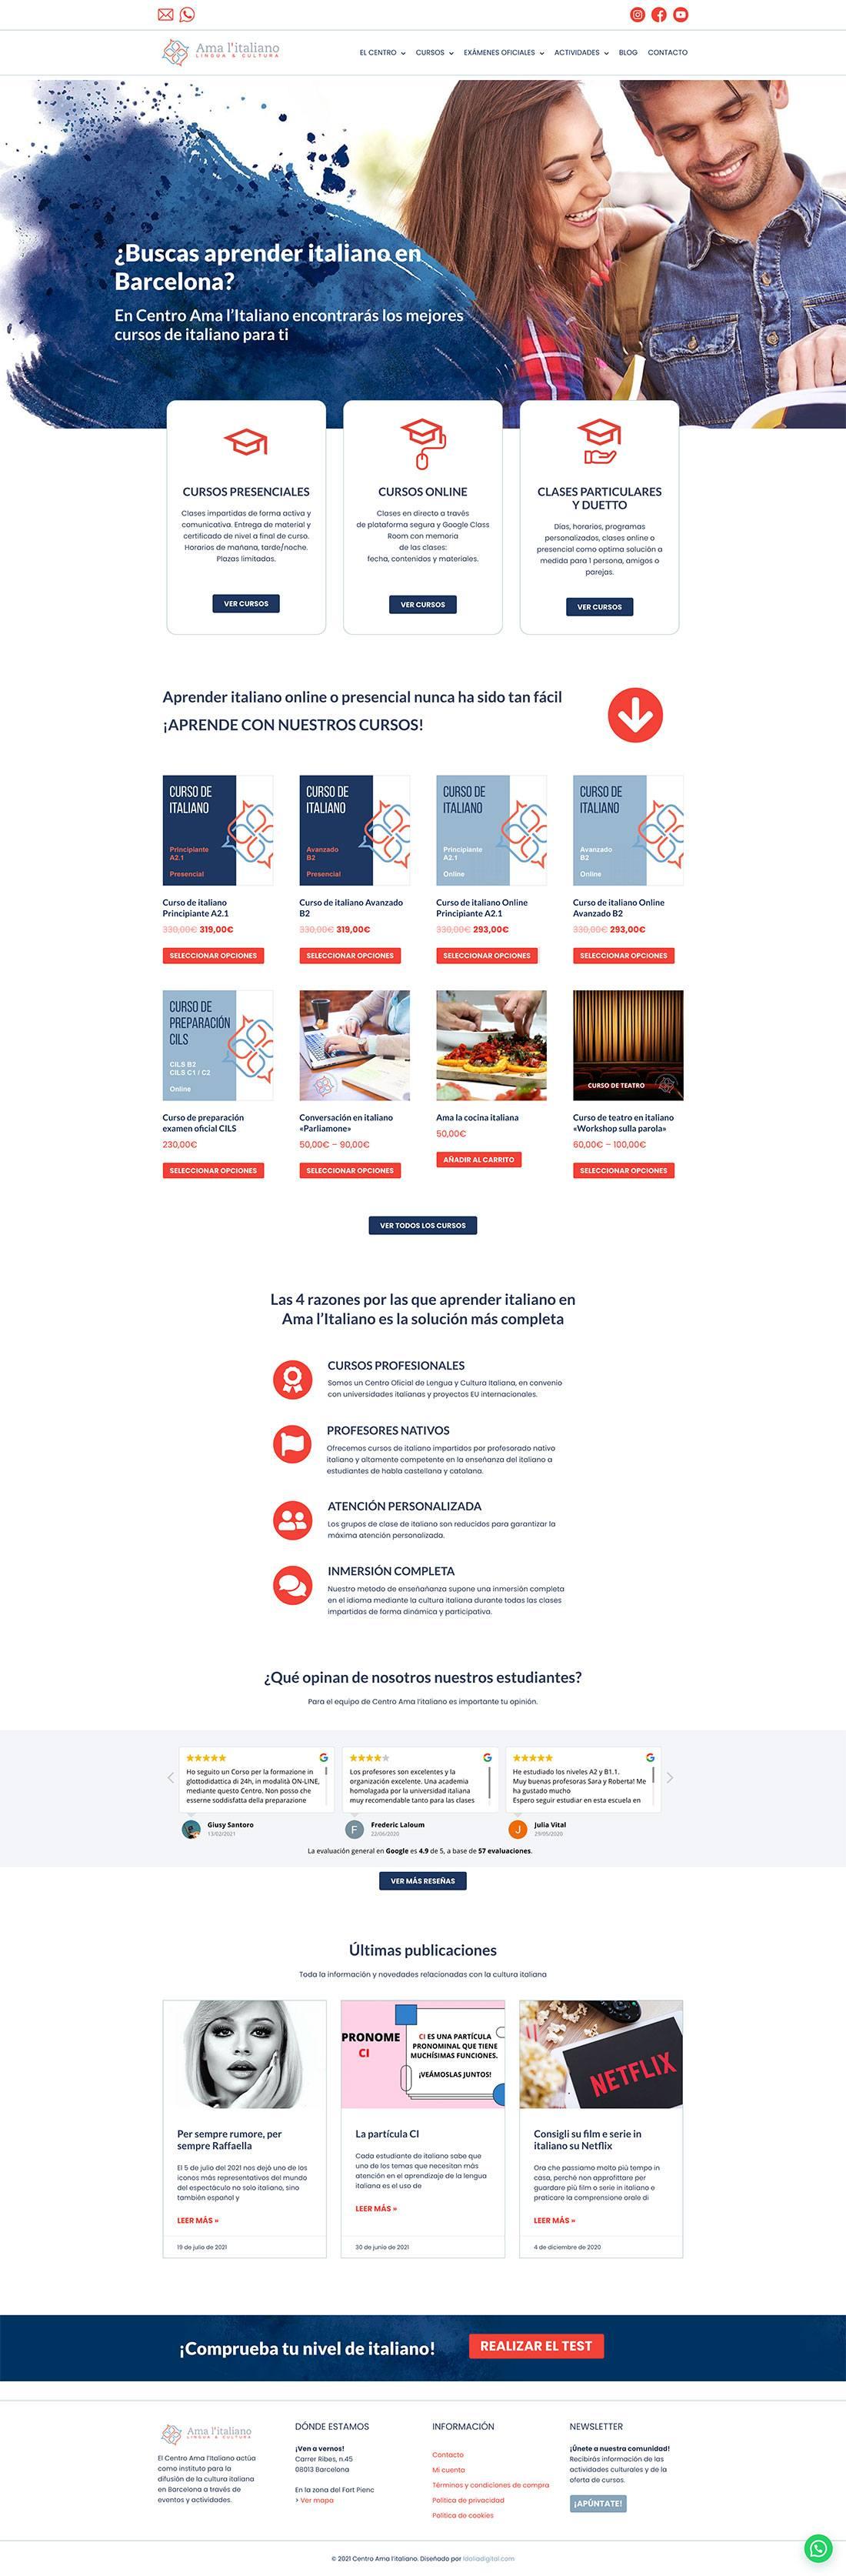 Página web Centro Ama l'italiano